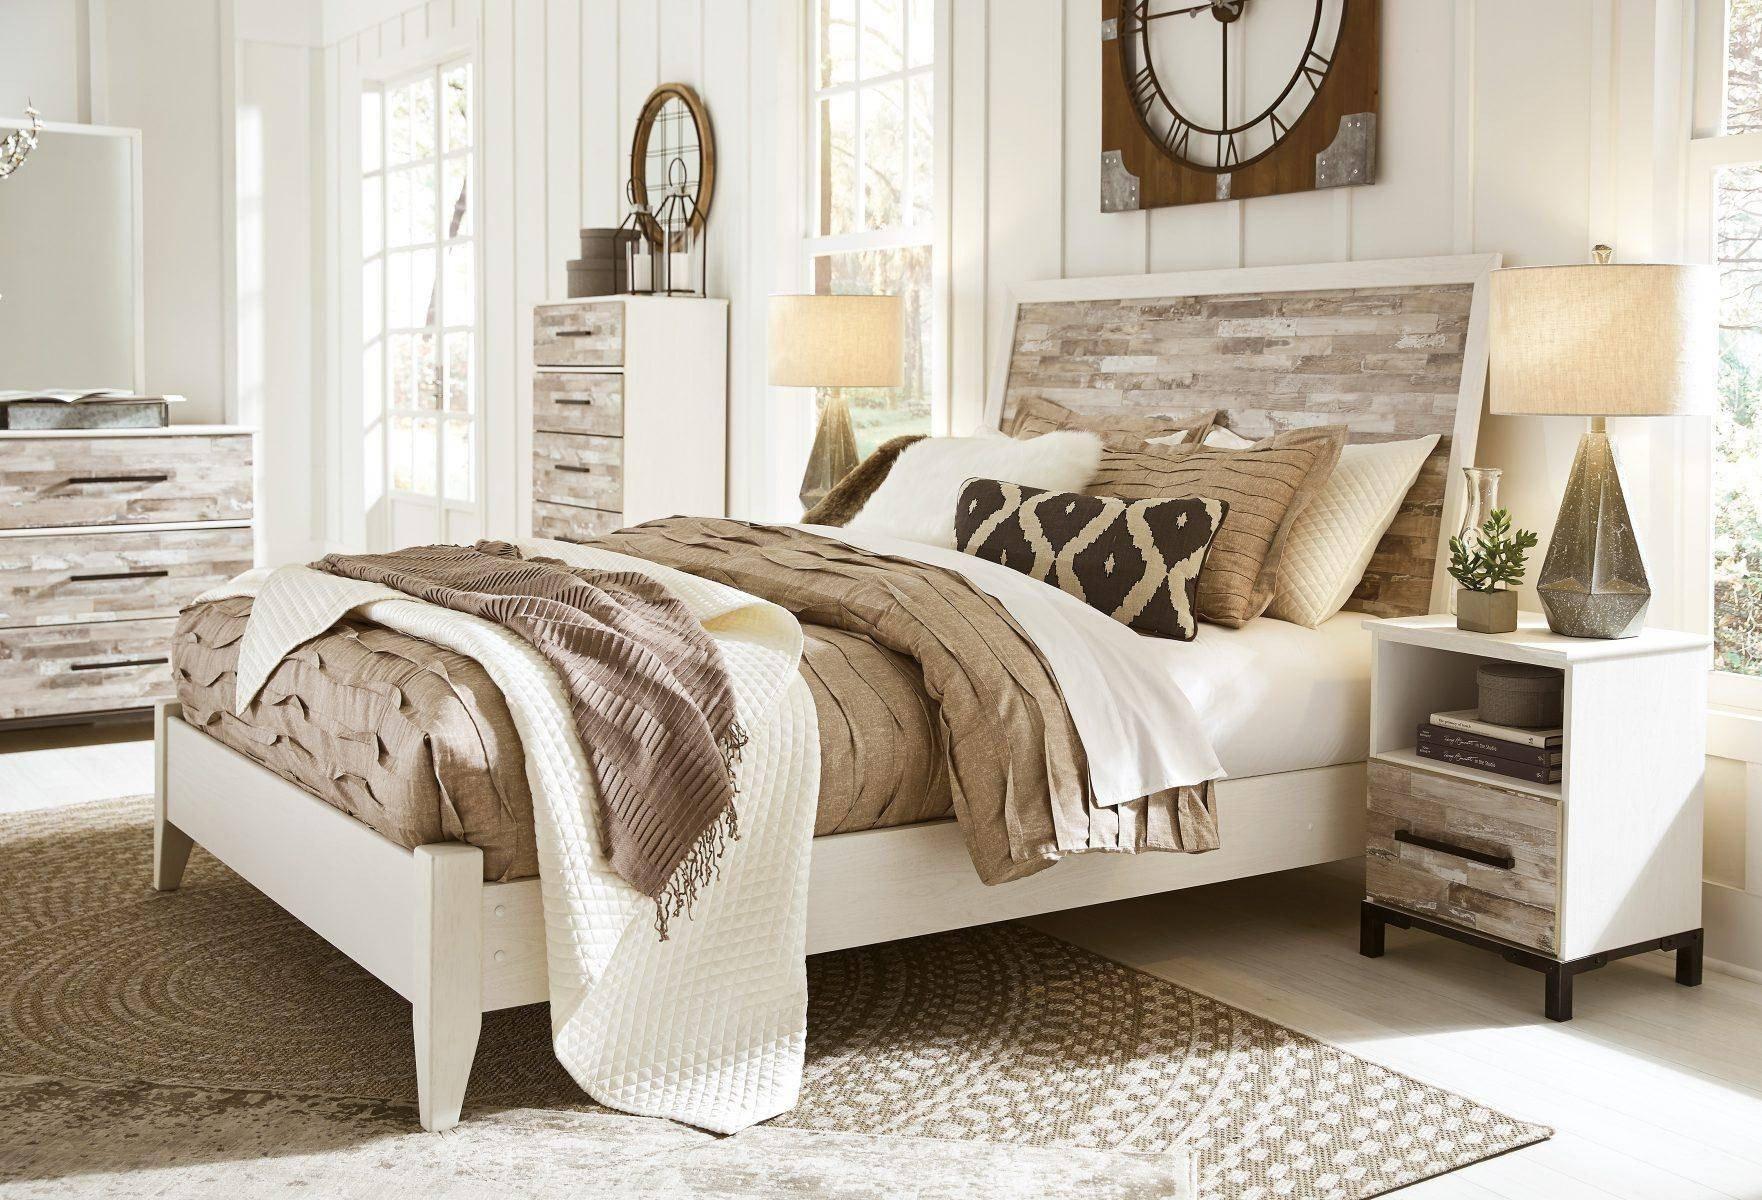 Ashley Black Bedroom Set Beautiful ashley Evanni B315 Queen Size Platform Bedroom Set 6pcs In